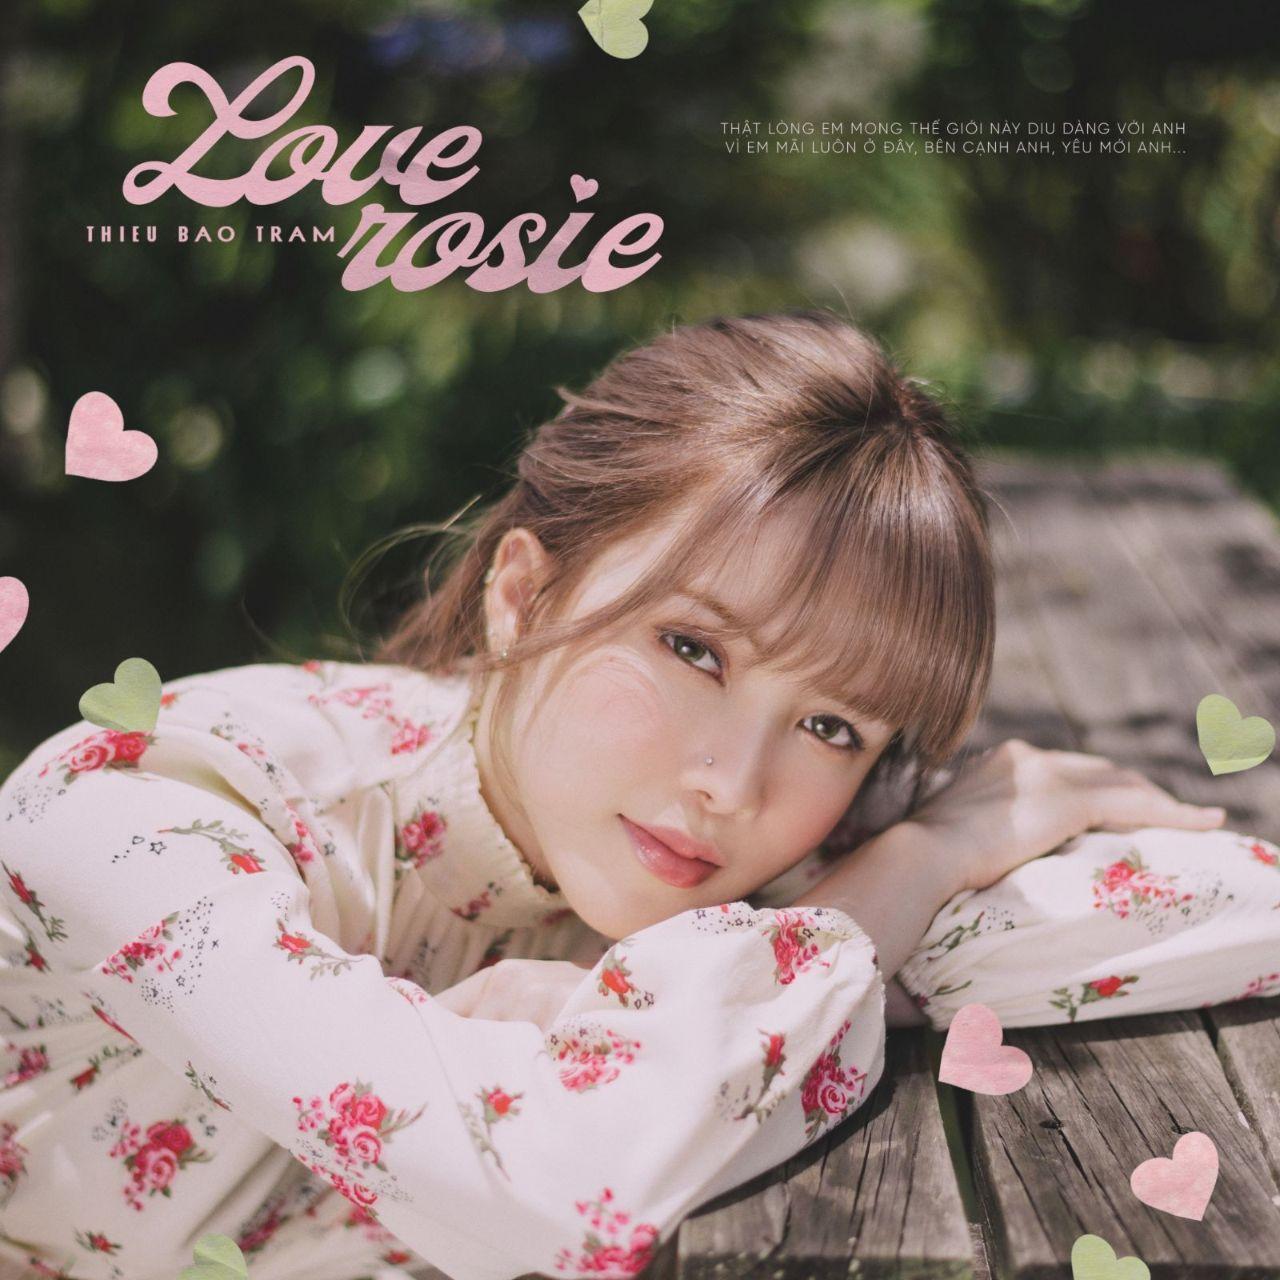 Cover Mp3 Love Rosie Thieu Bao Tram 1 1